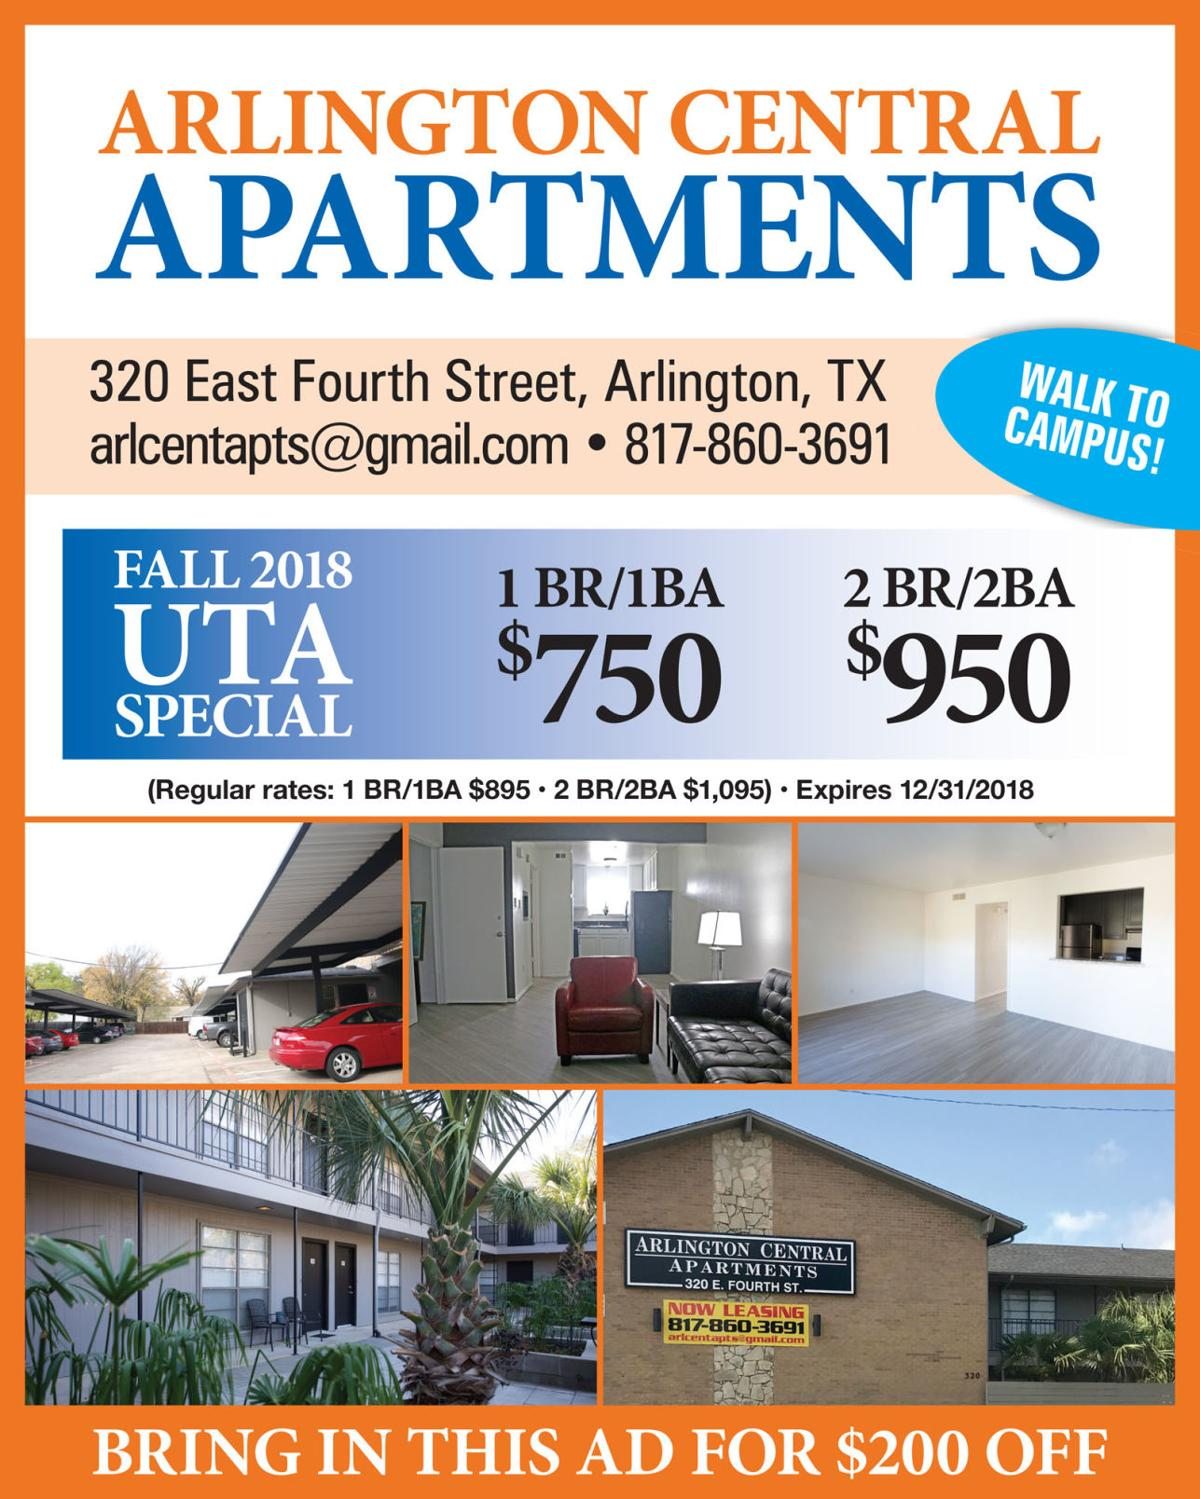 Arlington Central Apartments